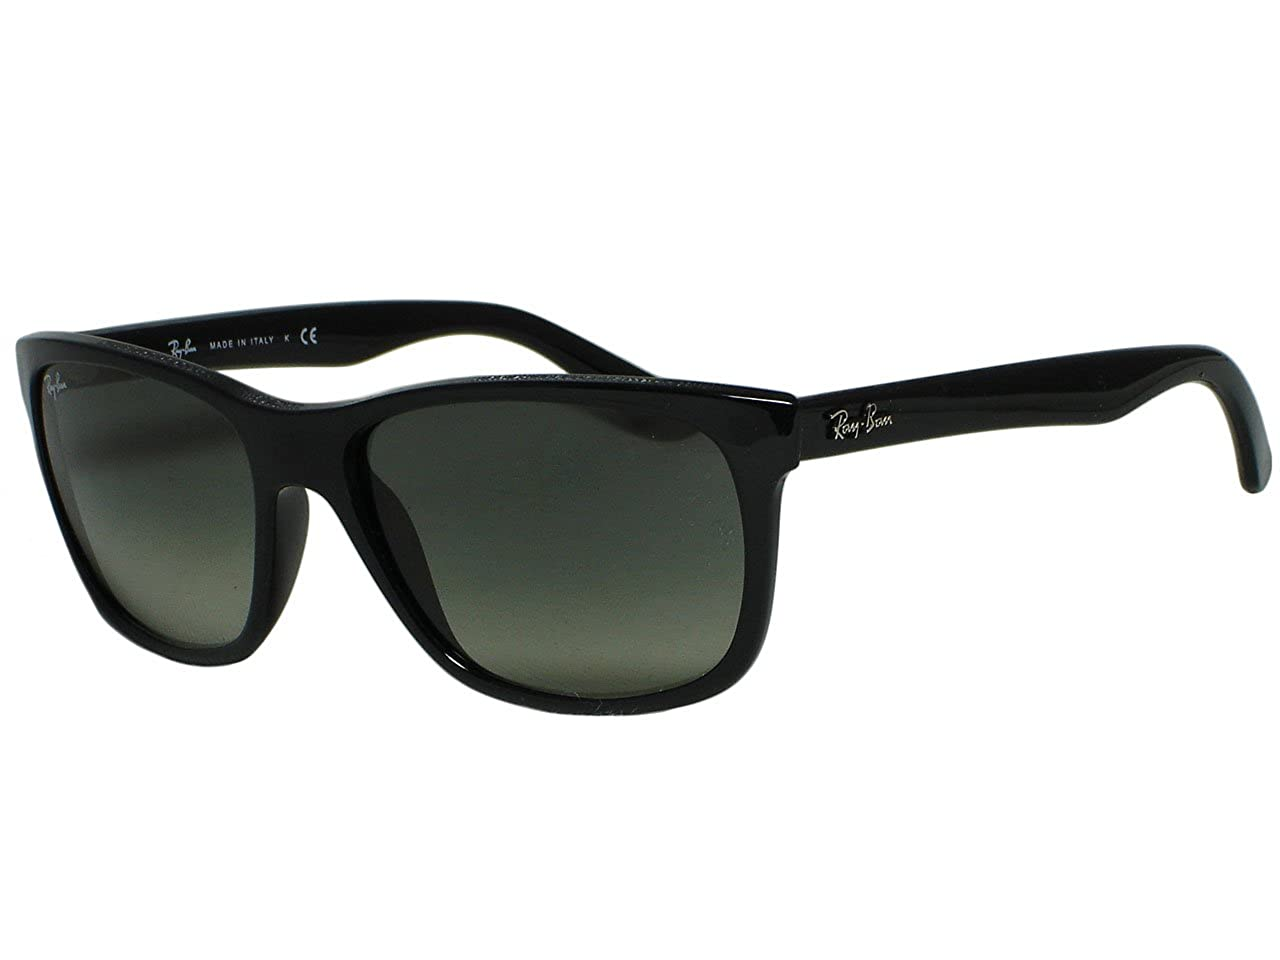 4c7b49e8d6d Amazon.com  Ray Ban RB4181 601 71 Black Sunglasses 57mm  Clothing